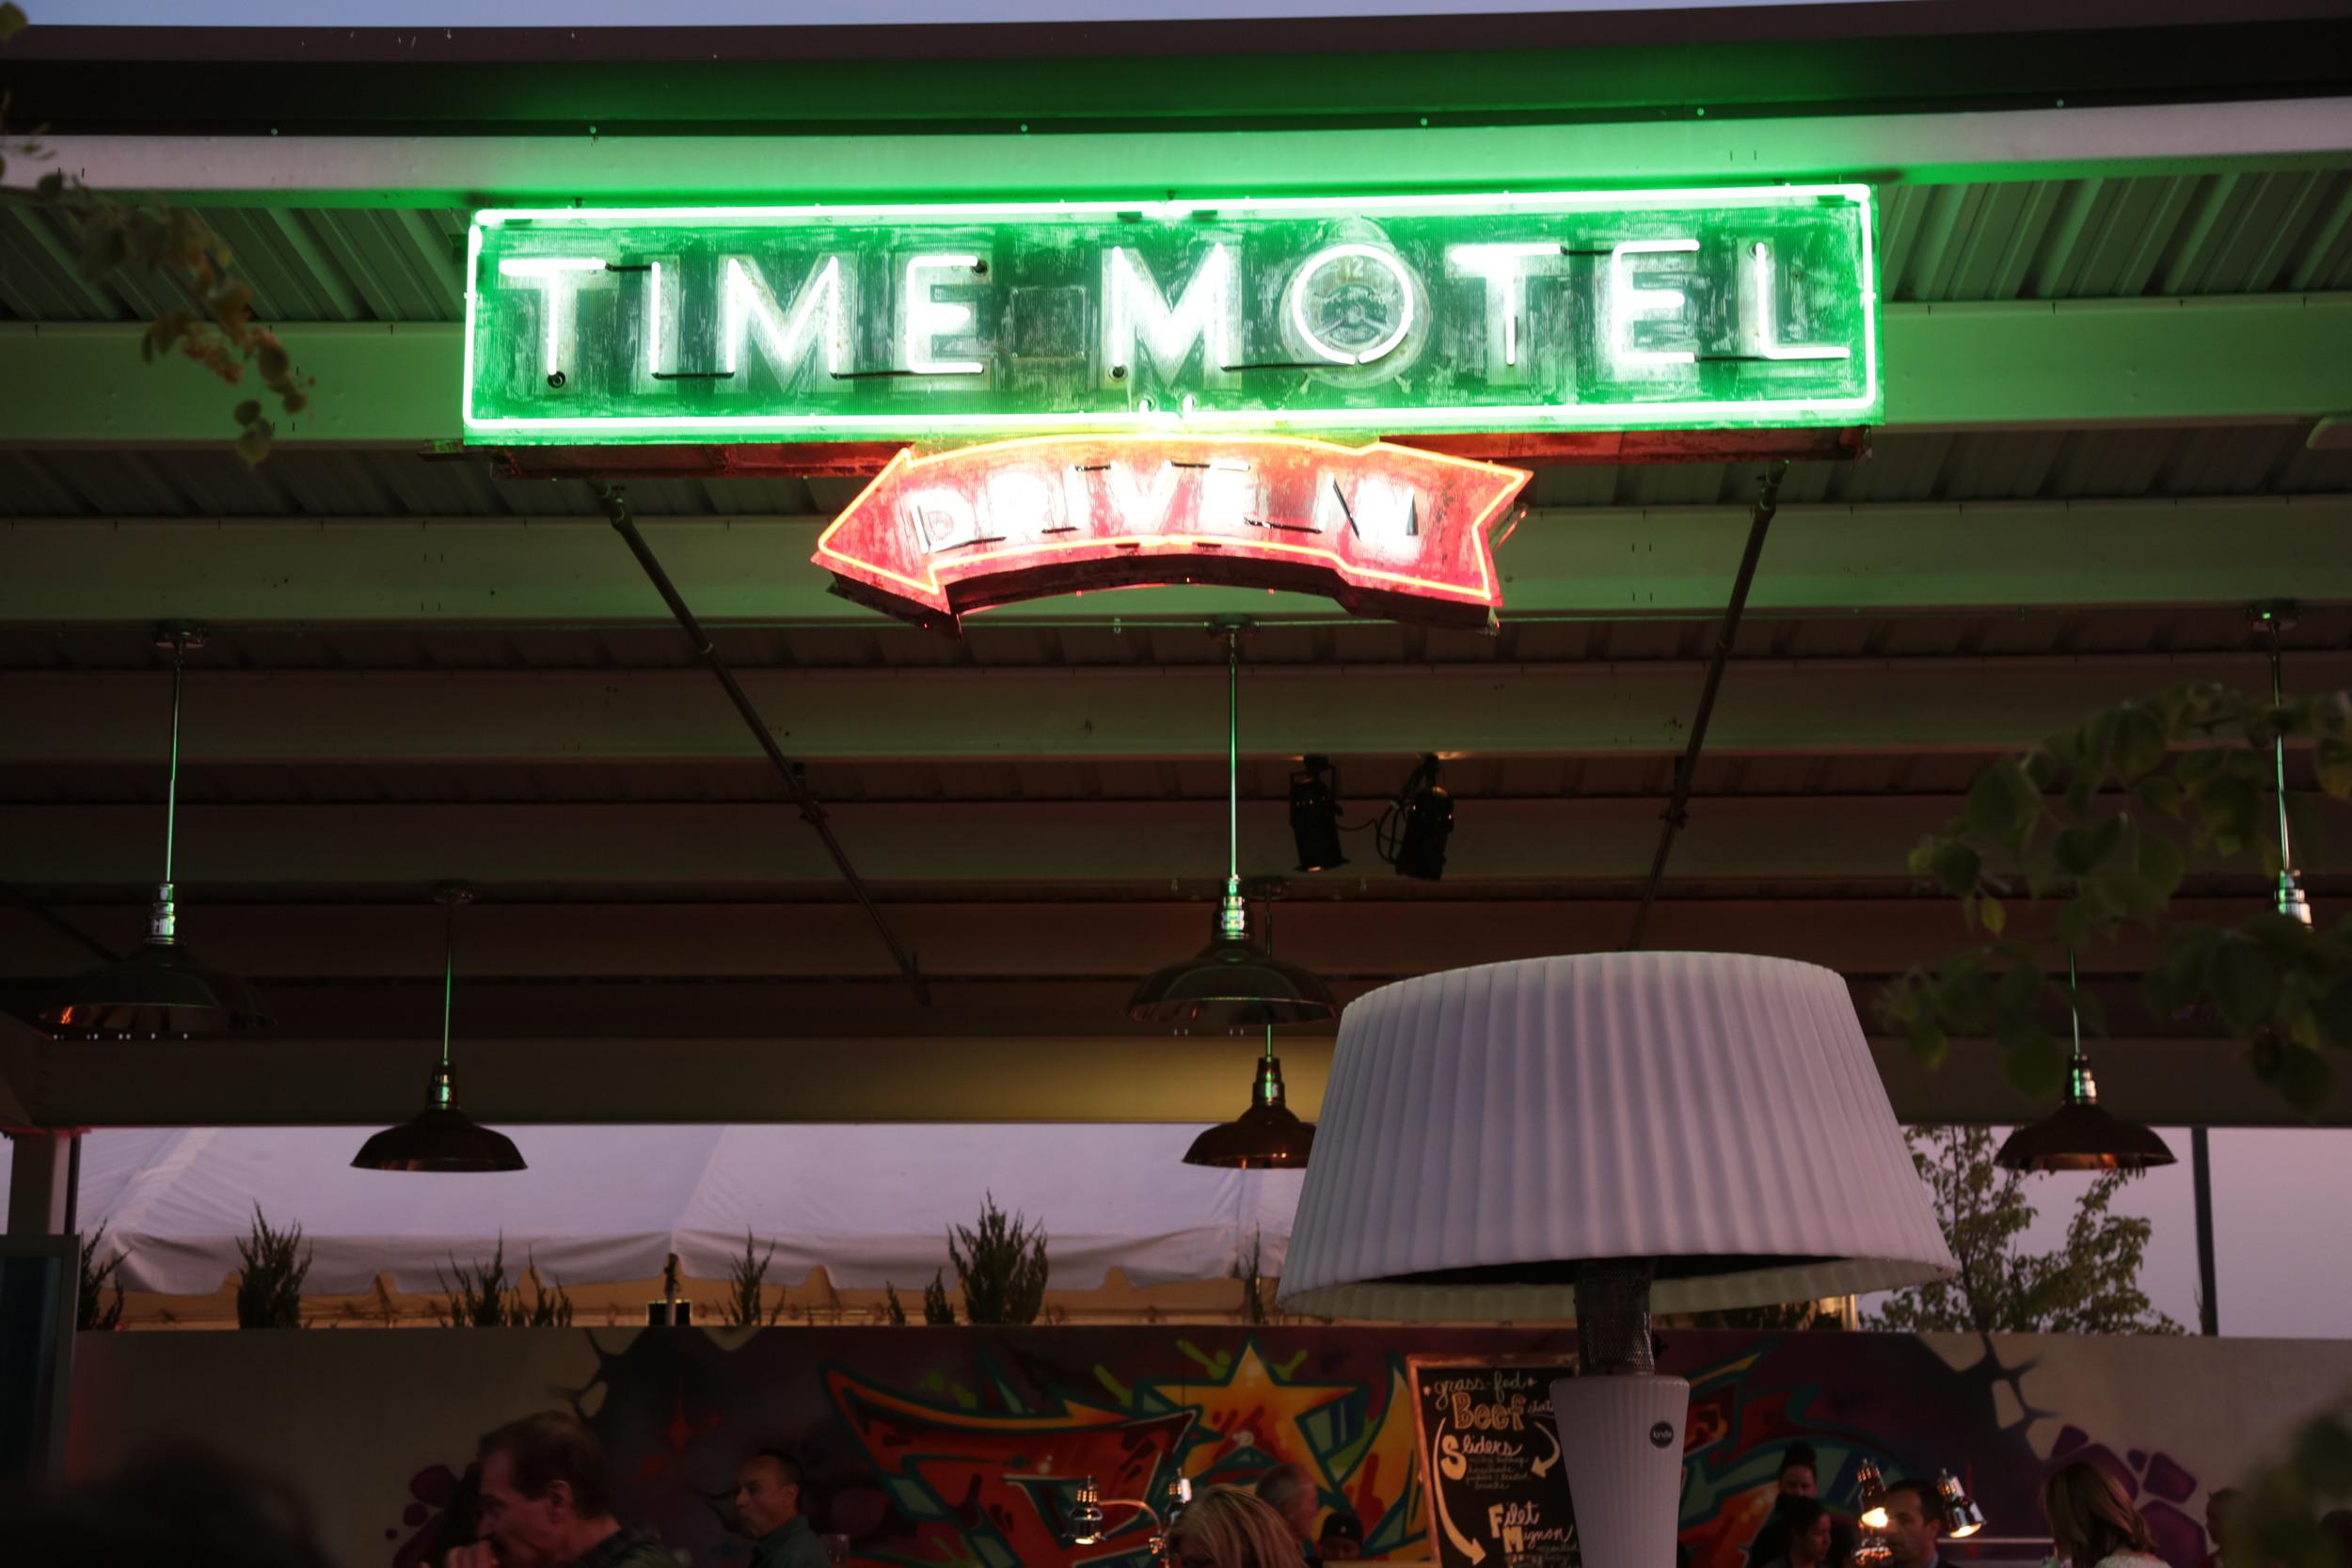 Munchkin time motel drive in neon.JPG